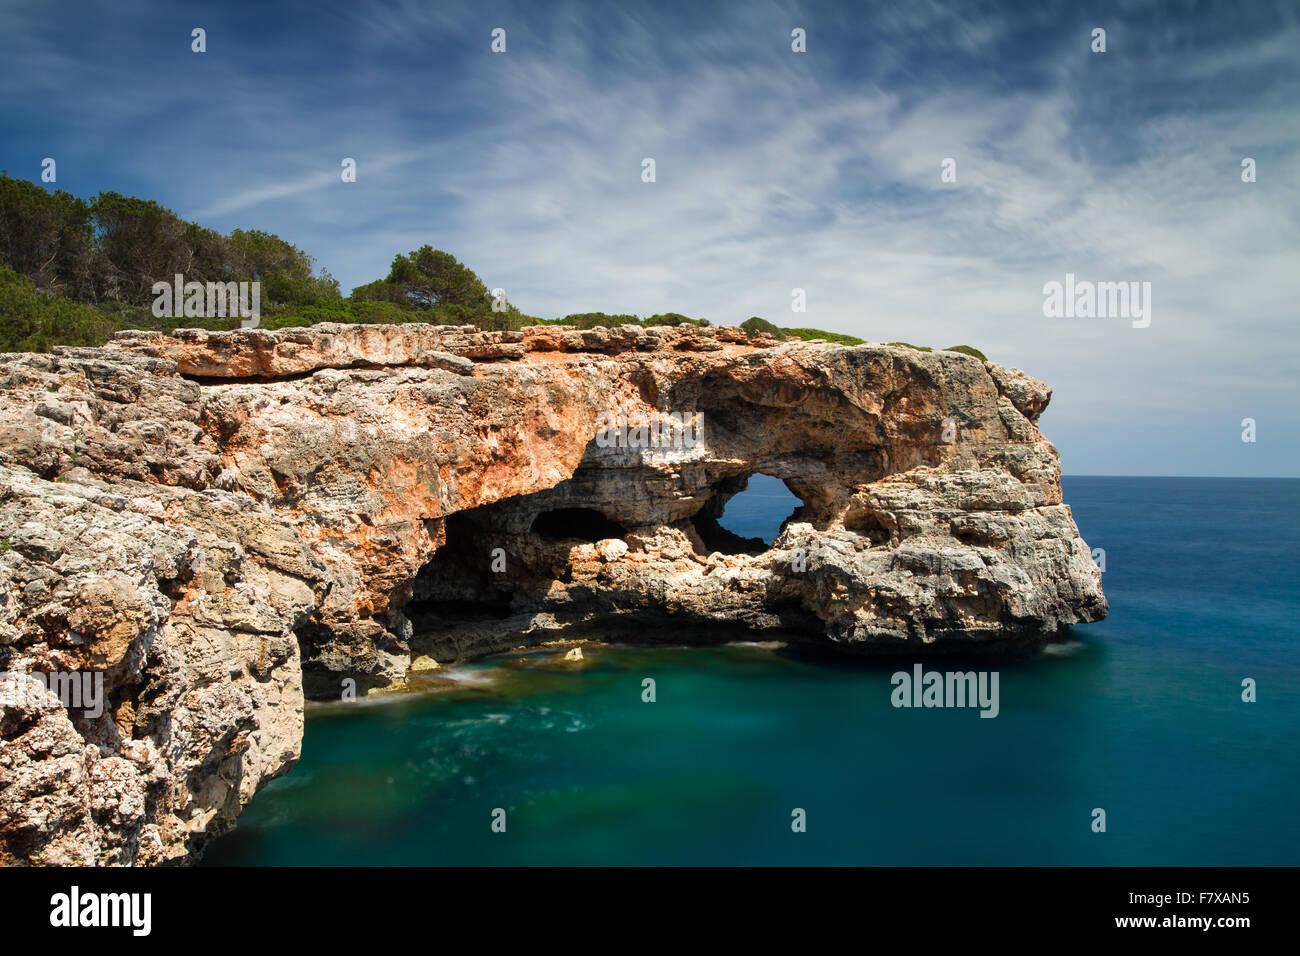 Hole in the rock at Cala Sa Nau - Long exposure version, Mallorca, Baleares, Spain - Stock Image